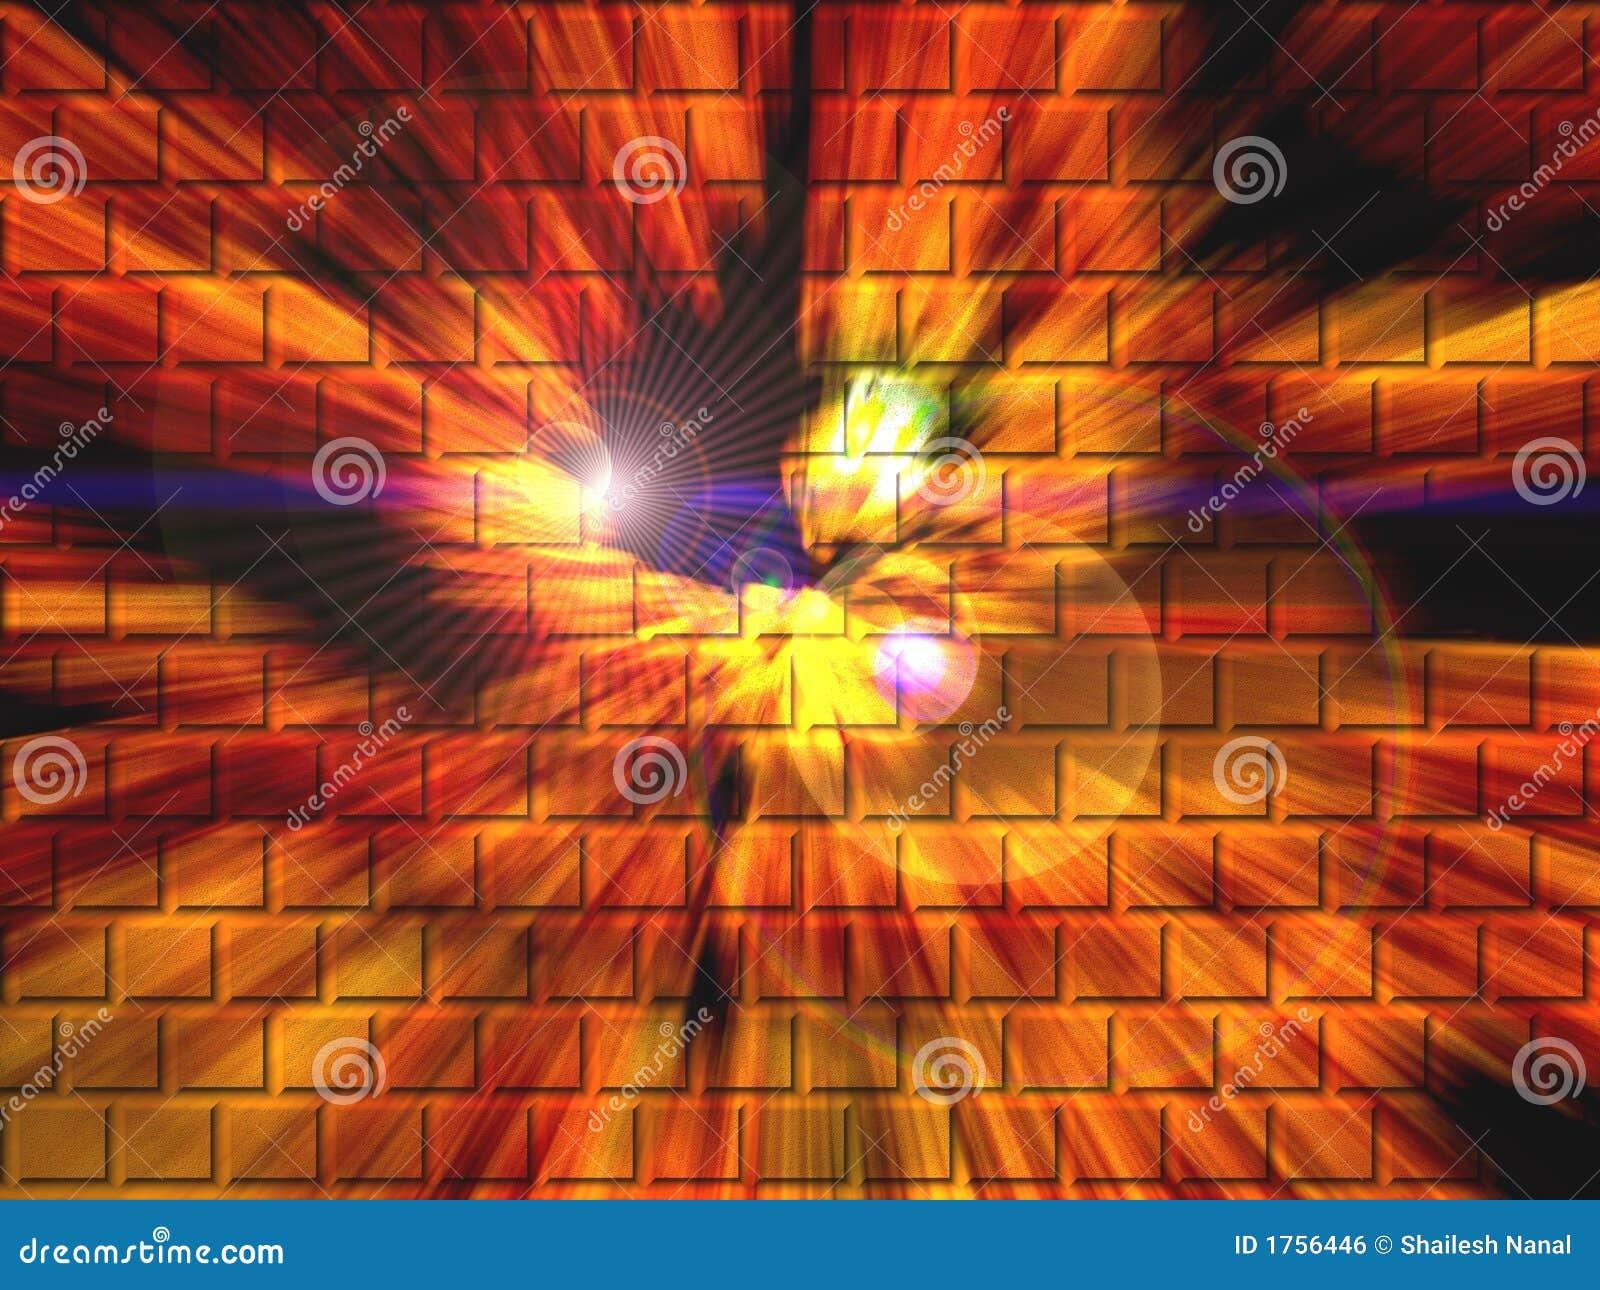 Colorful Brick Wall Abstract Royalty Free Stock Image